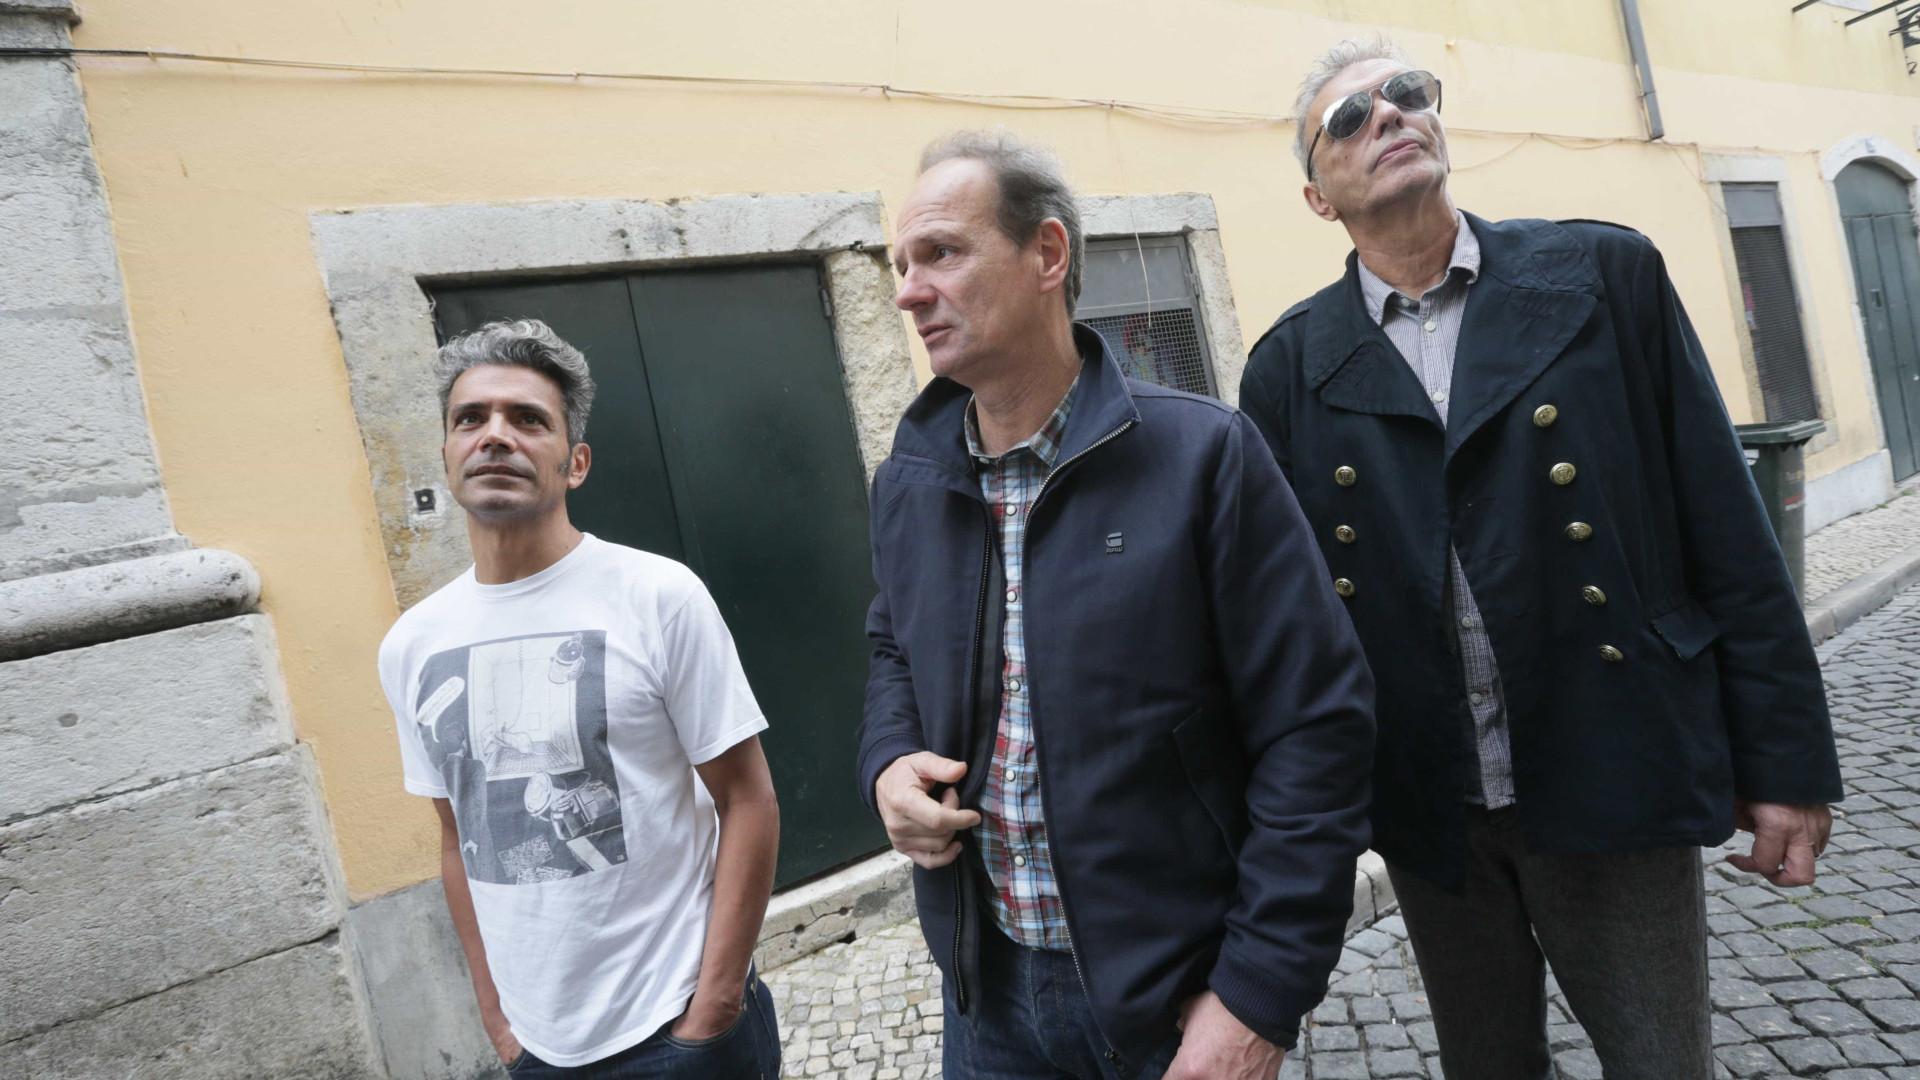 GNR e Blind Zero no Festival Douro Rock que começa sexta-feira na Régua